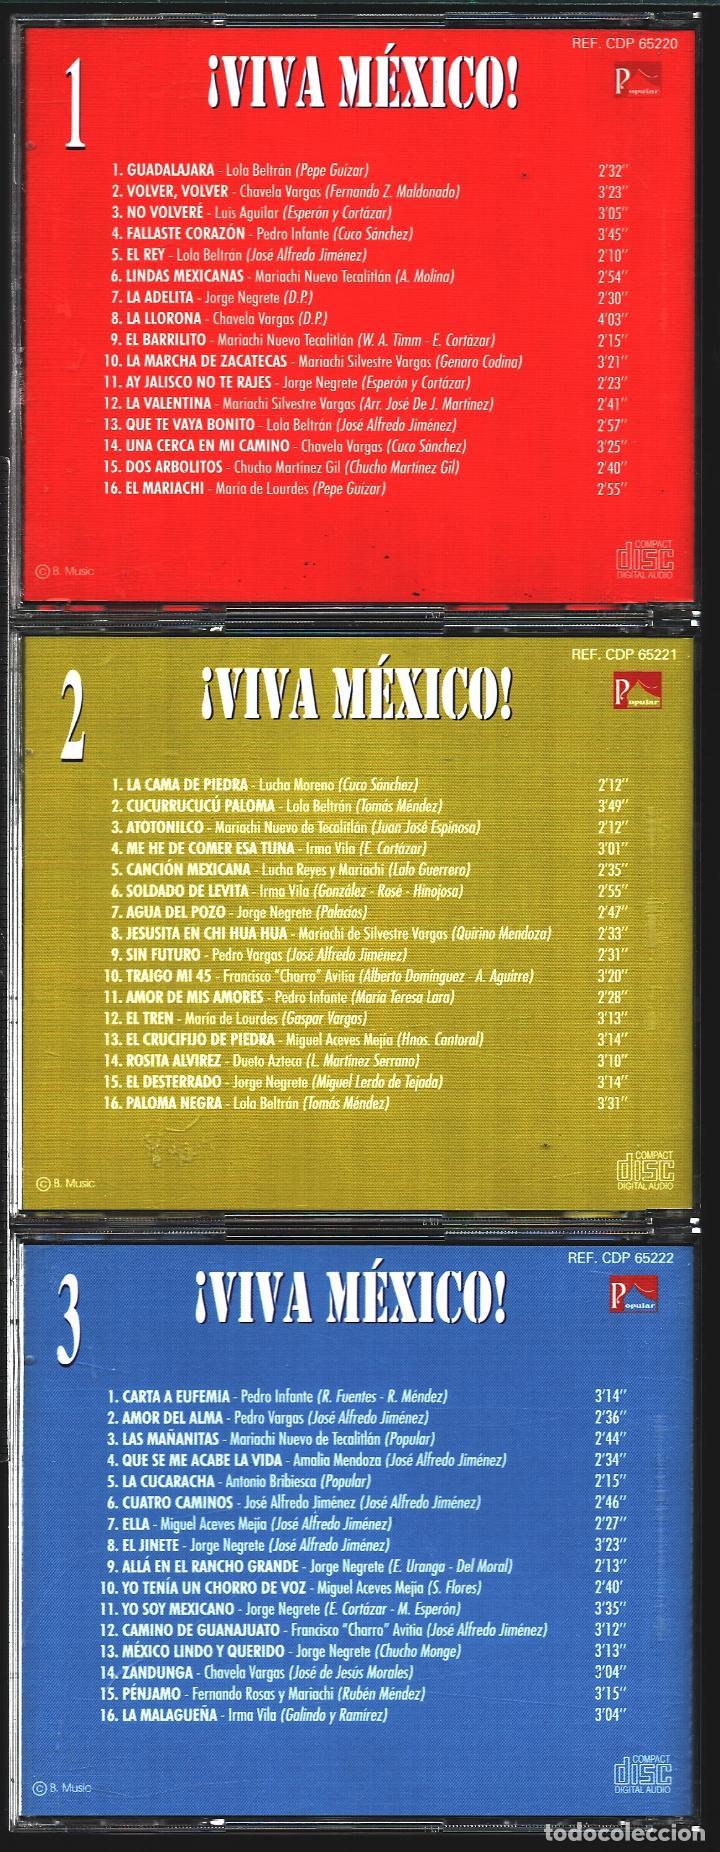 CDs de Música: MUSICA GOYO - CD ALBUM - VIVA MEXICO - CD TRIPLE - - RARO - *XX99 - Foto 8 - 100125687